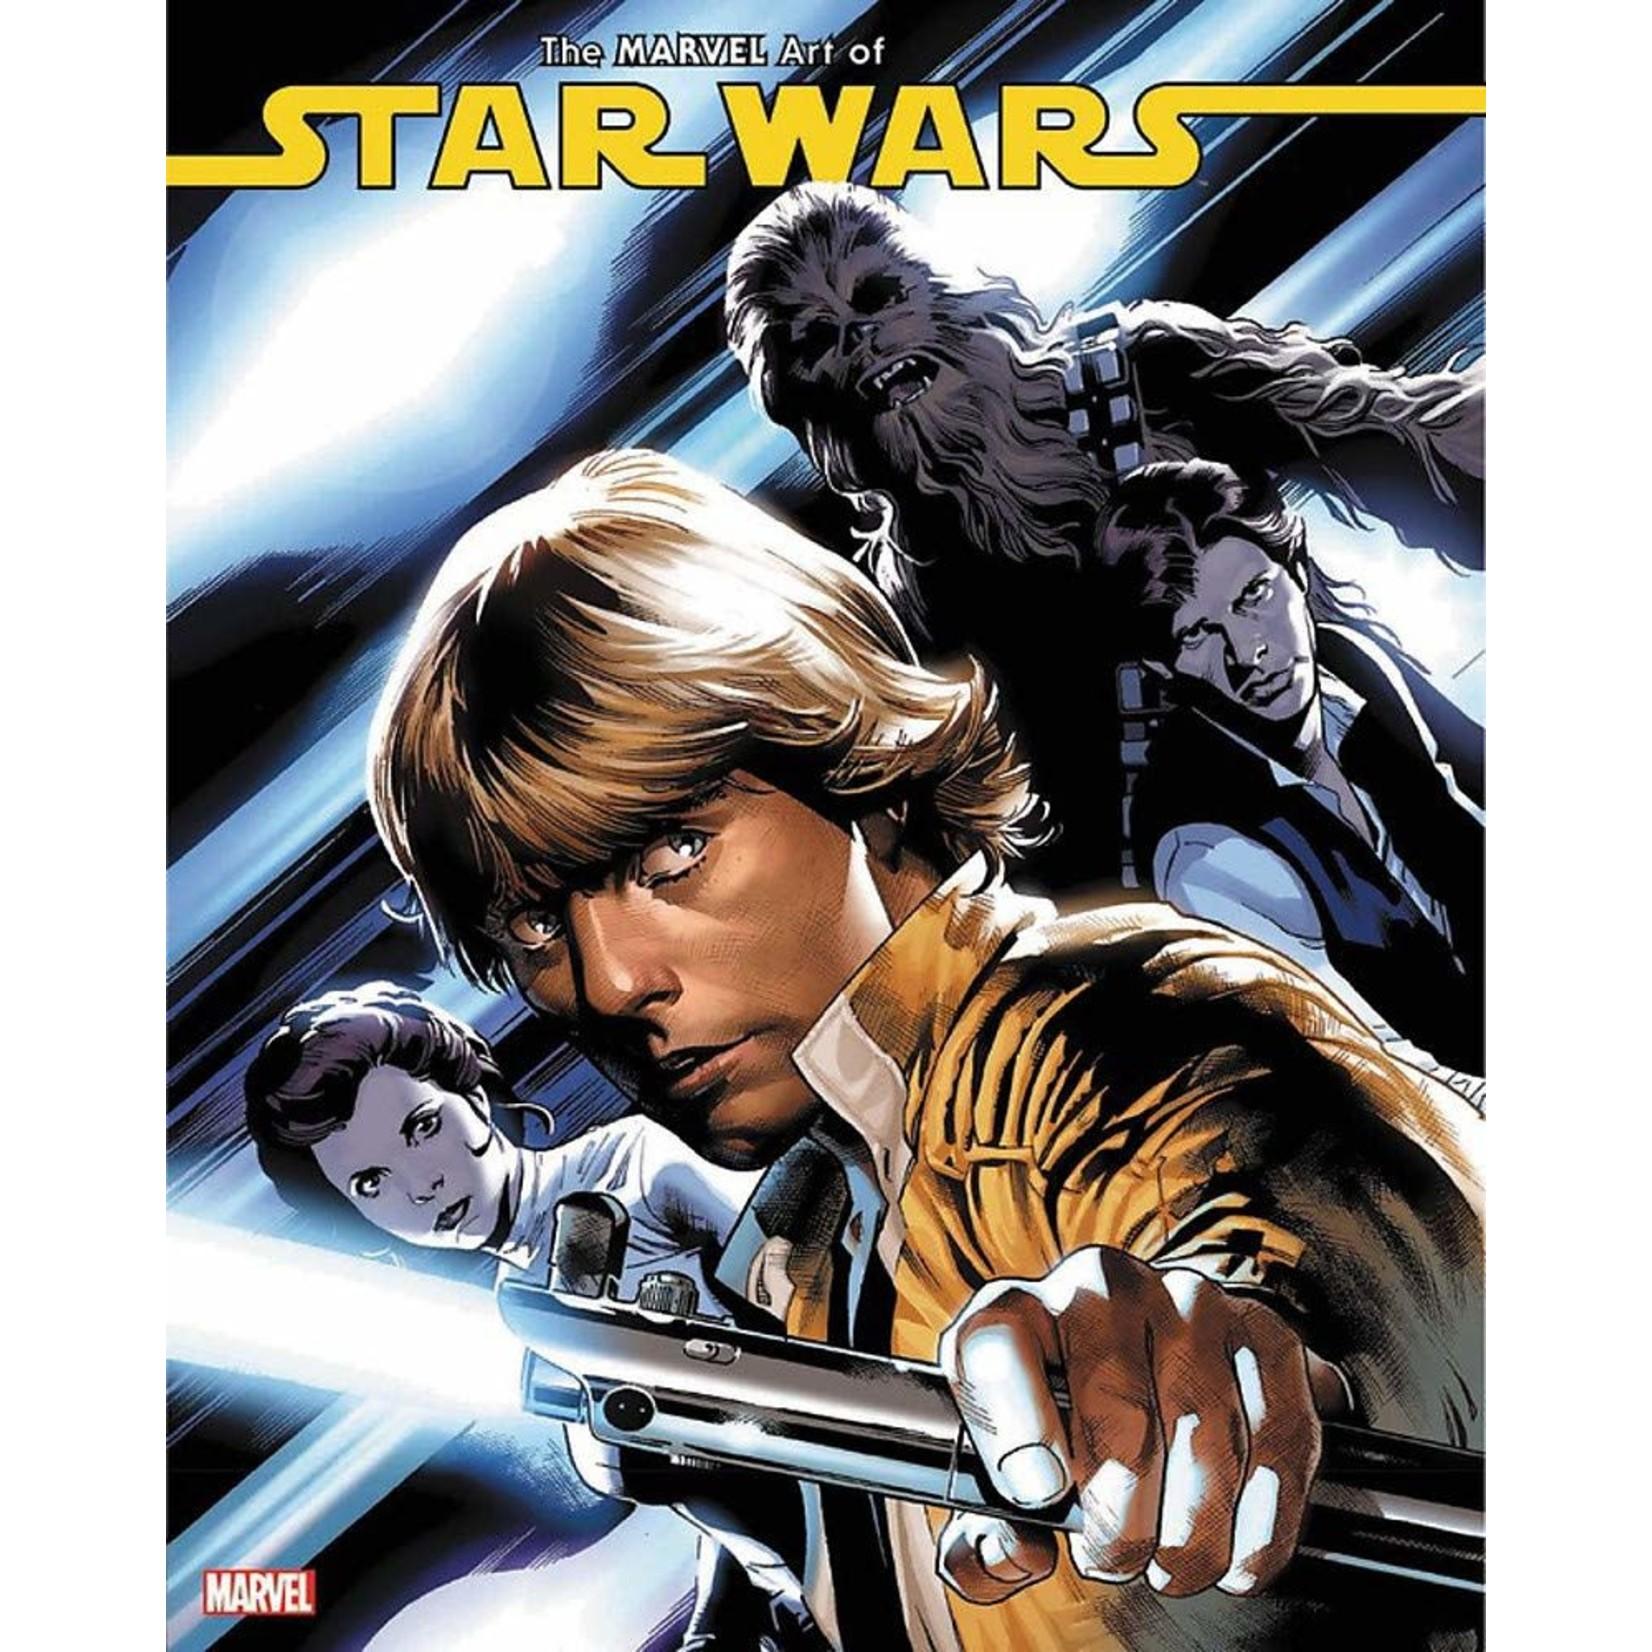 The Marvel Art Of Star Wars